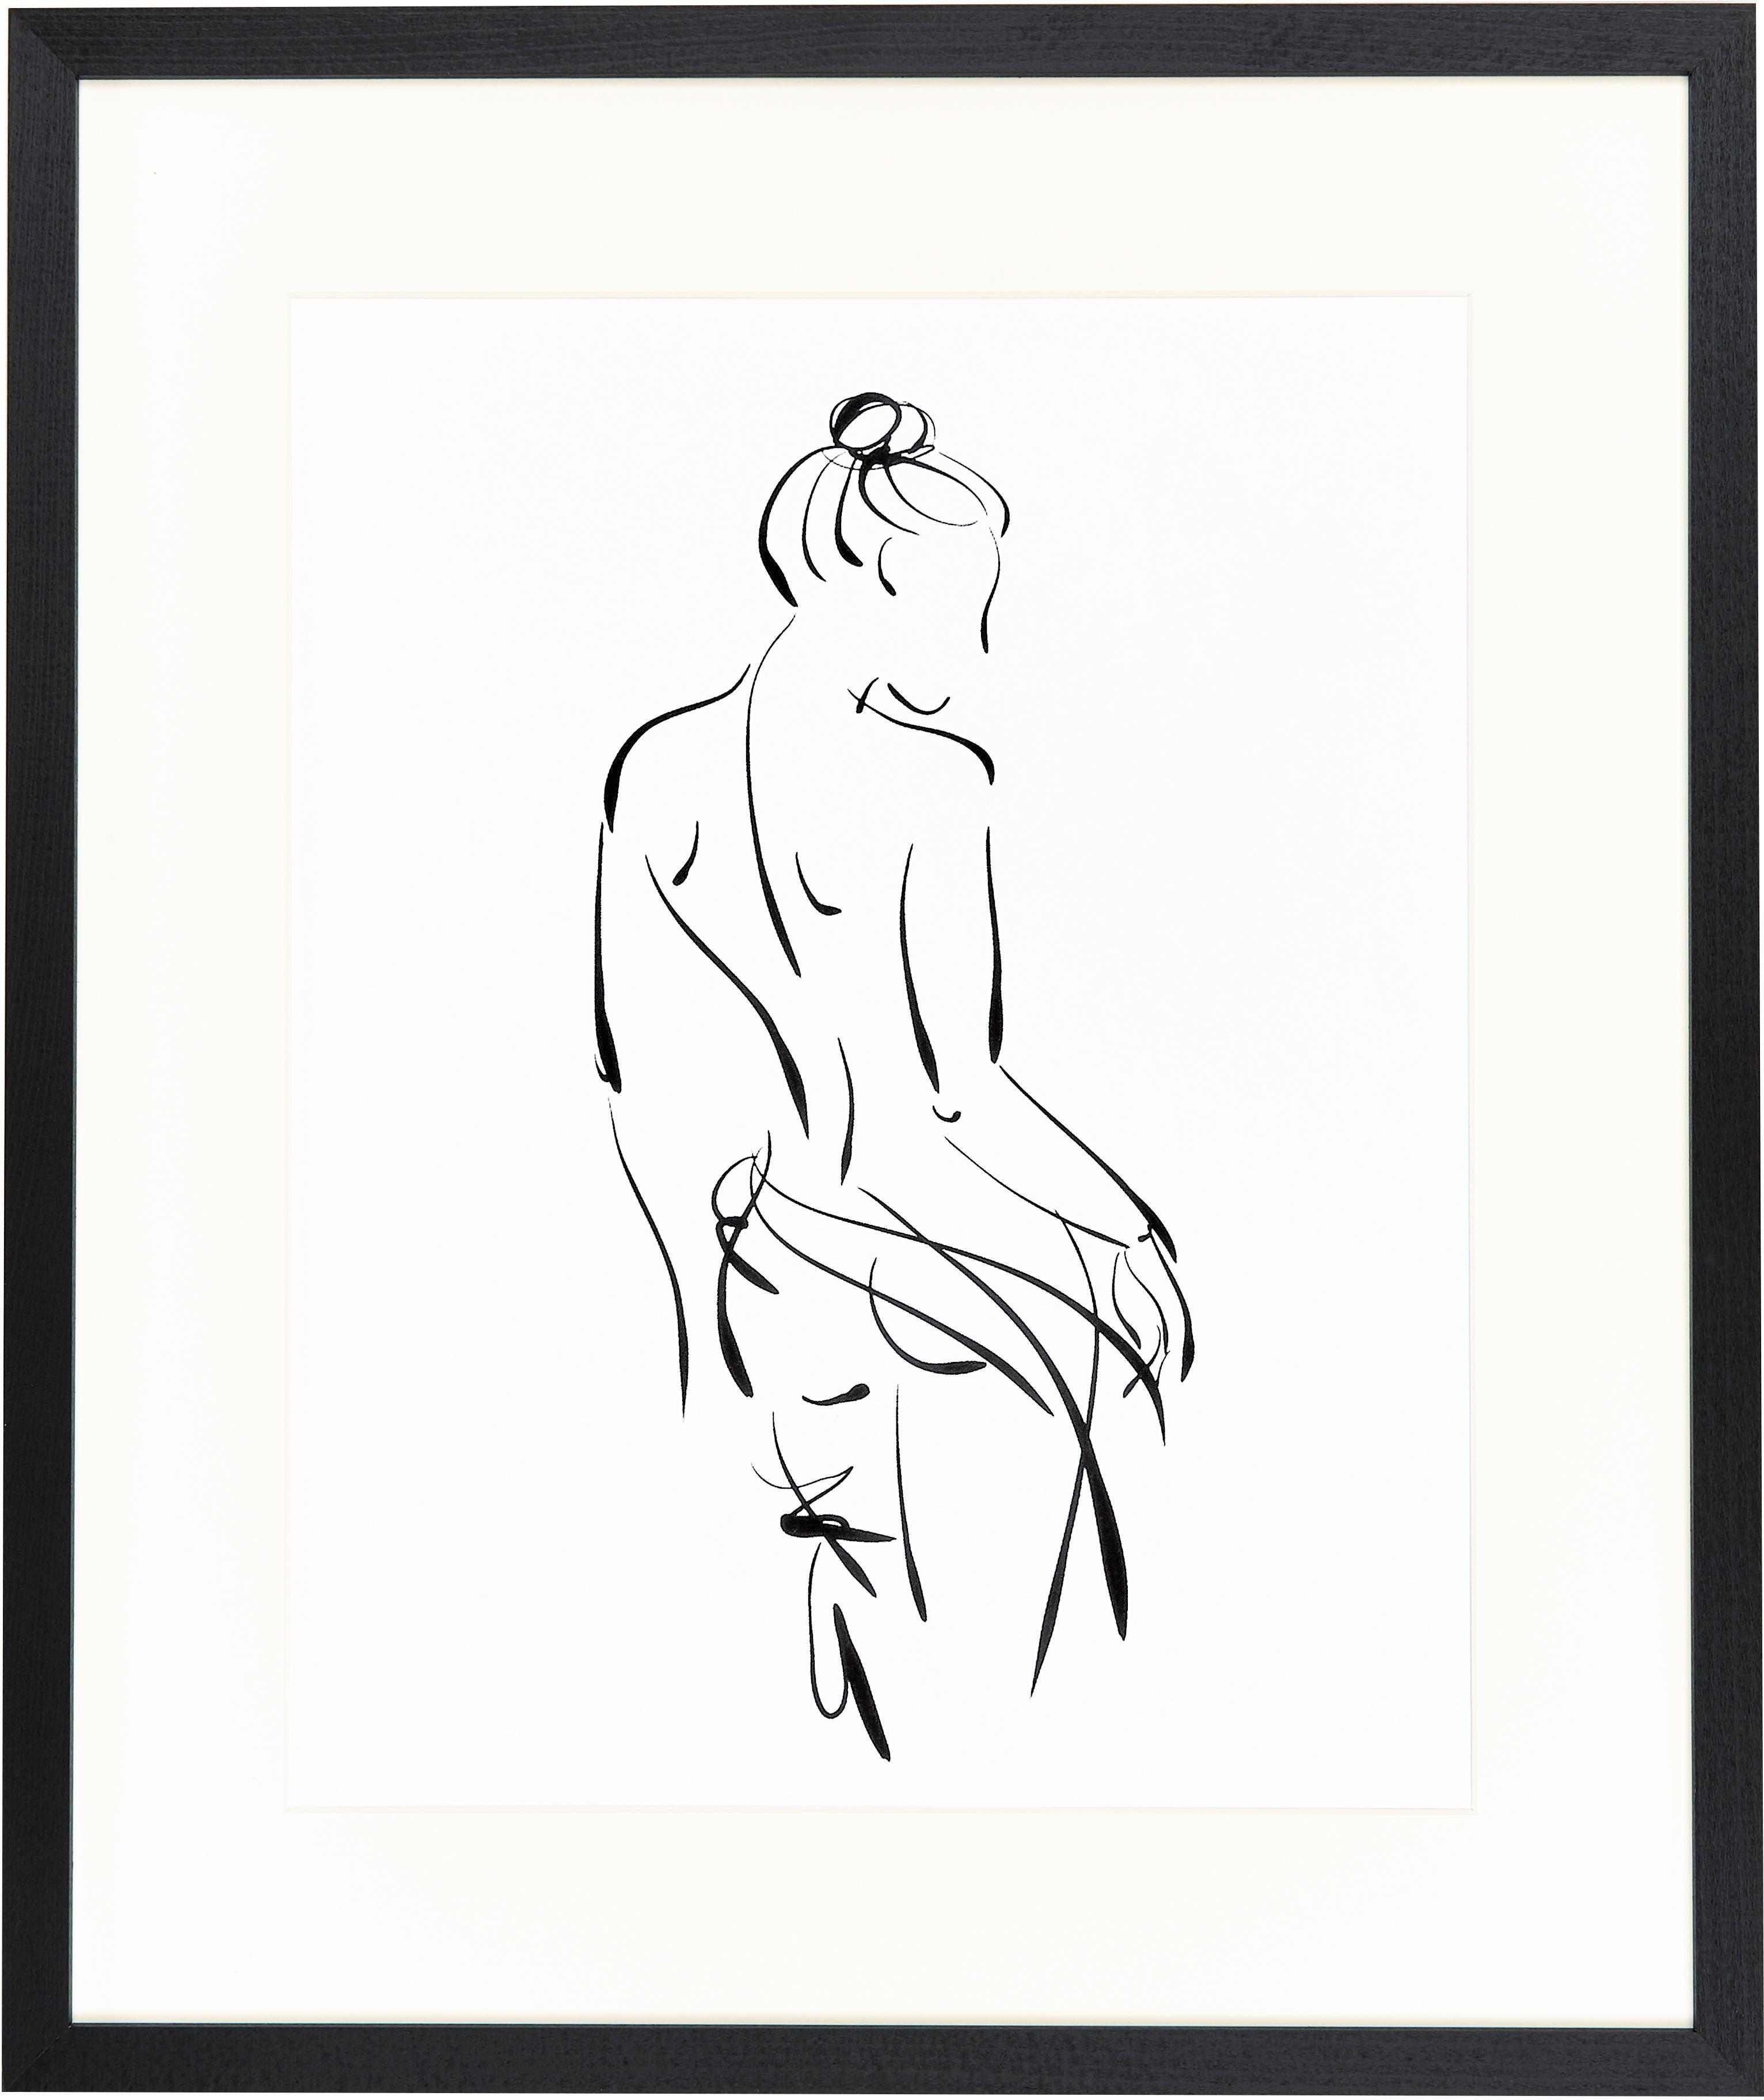 Ingelijste digitale print Naked Woman, Afbeelding: digitale print op papier,, Frame: gelakt hout, Zwart, wit, 53 x 63 cm